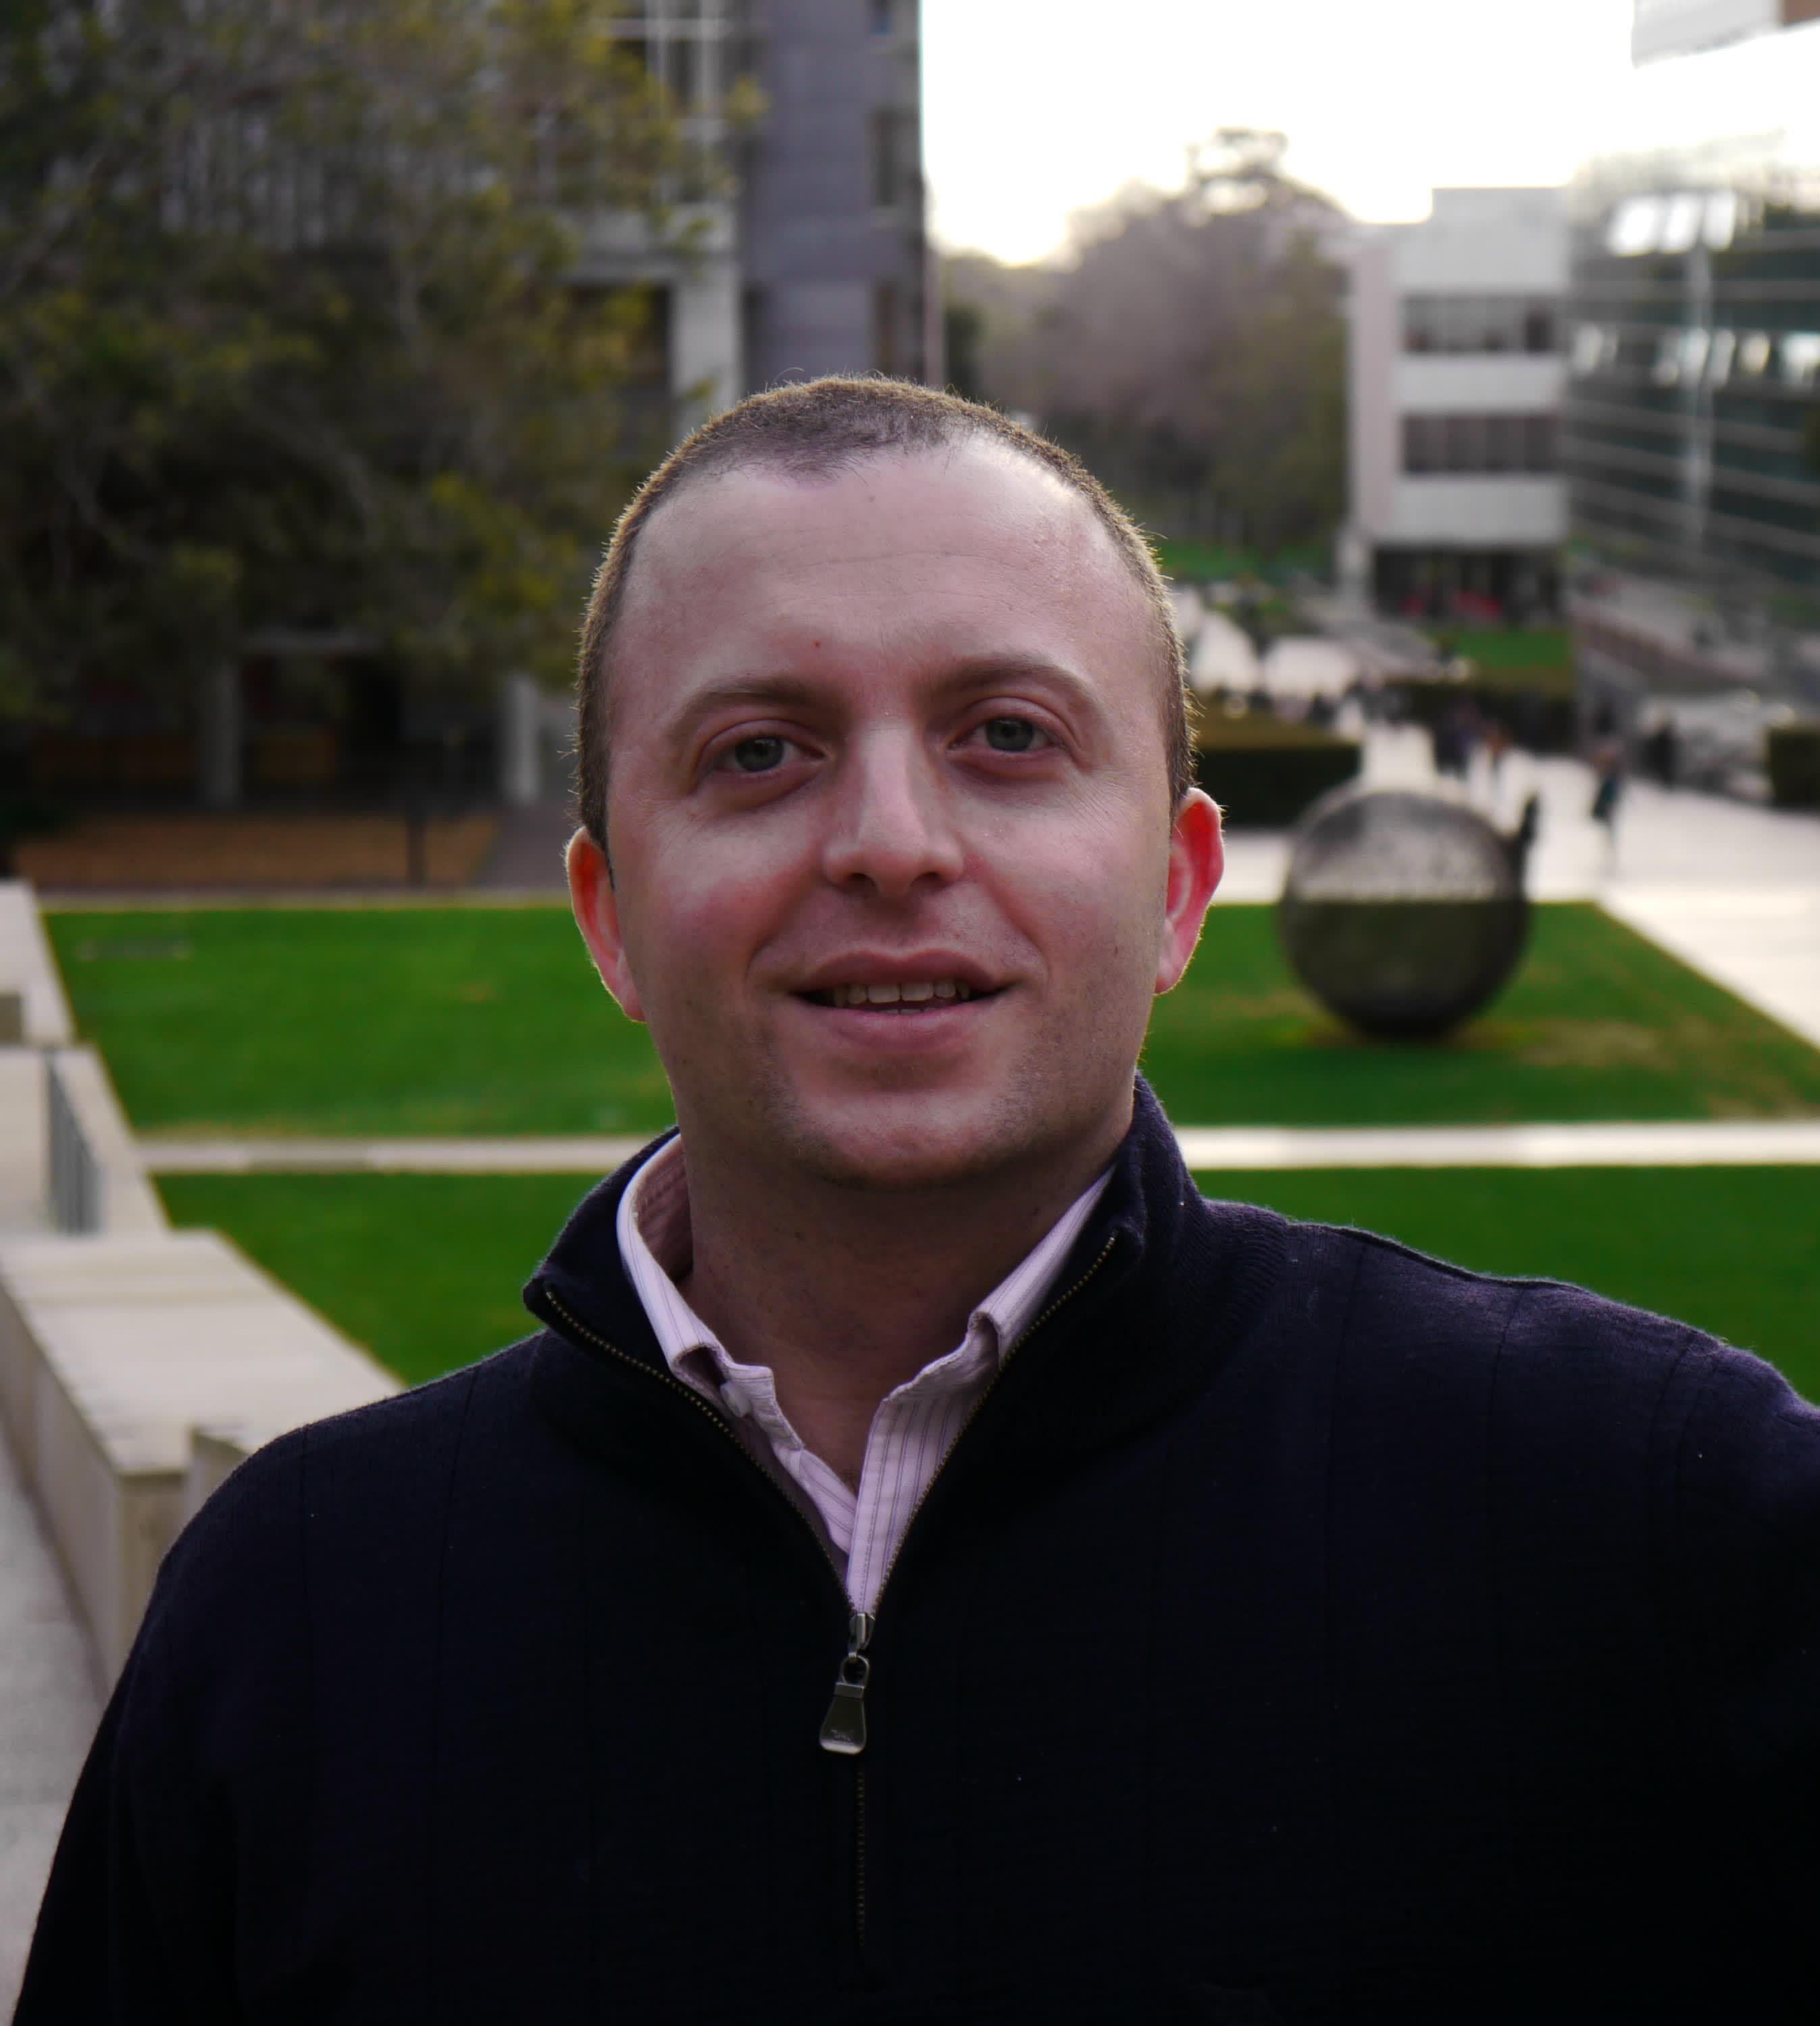 Joshua Flannery